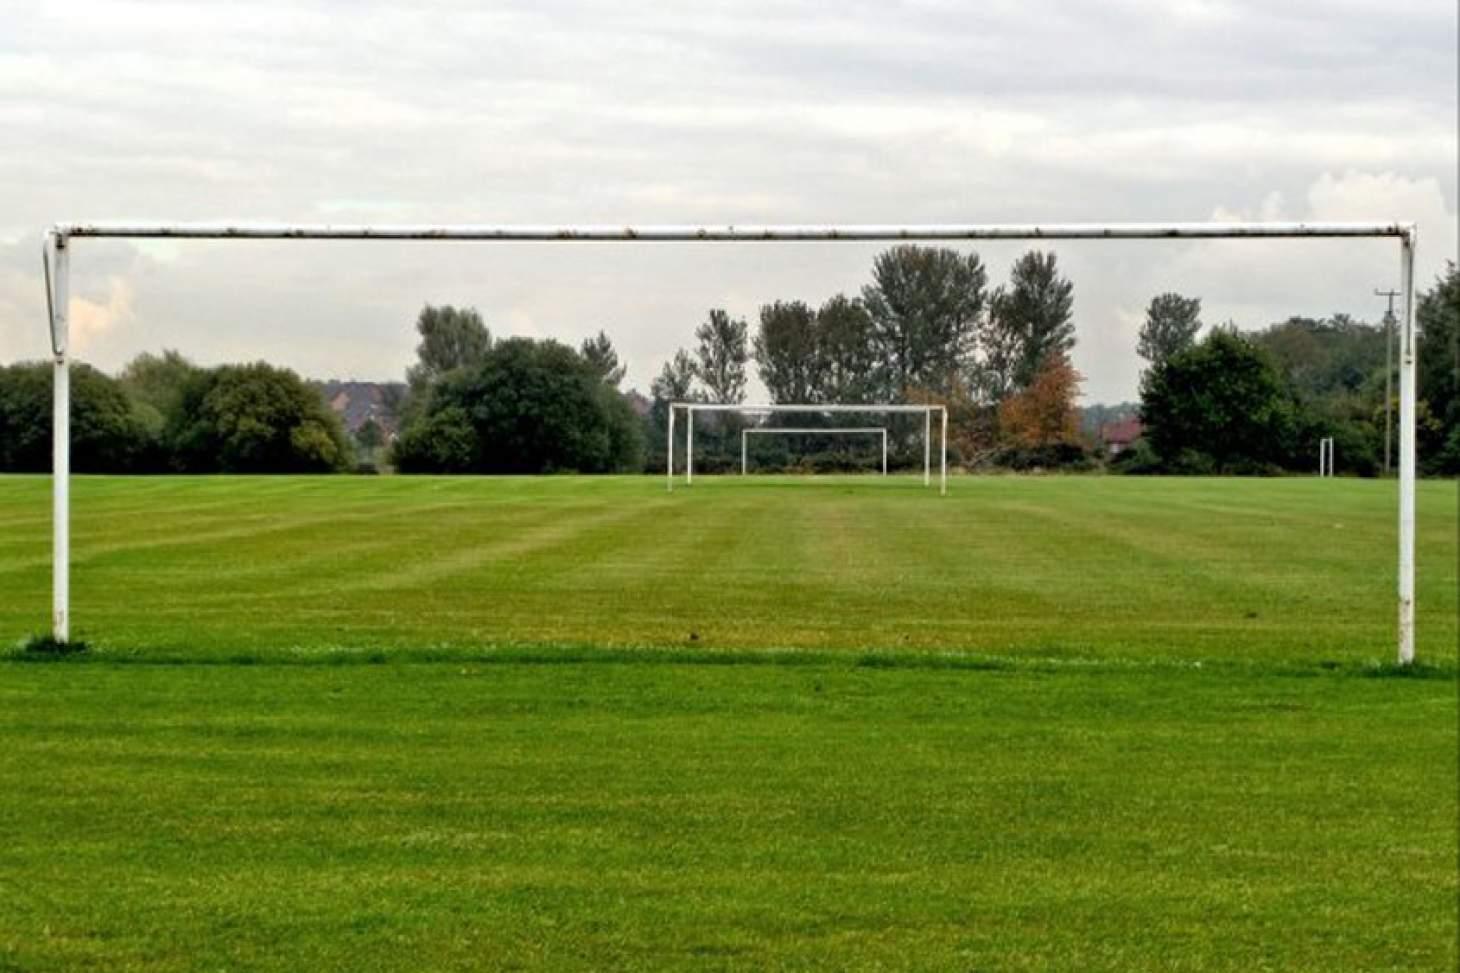 Southwick Recreation Ground 11 a side | Grass football pitch